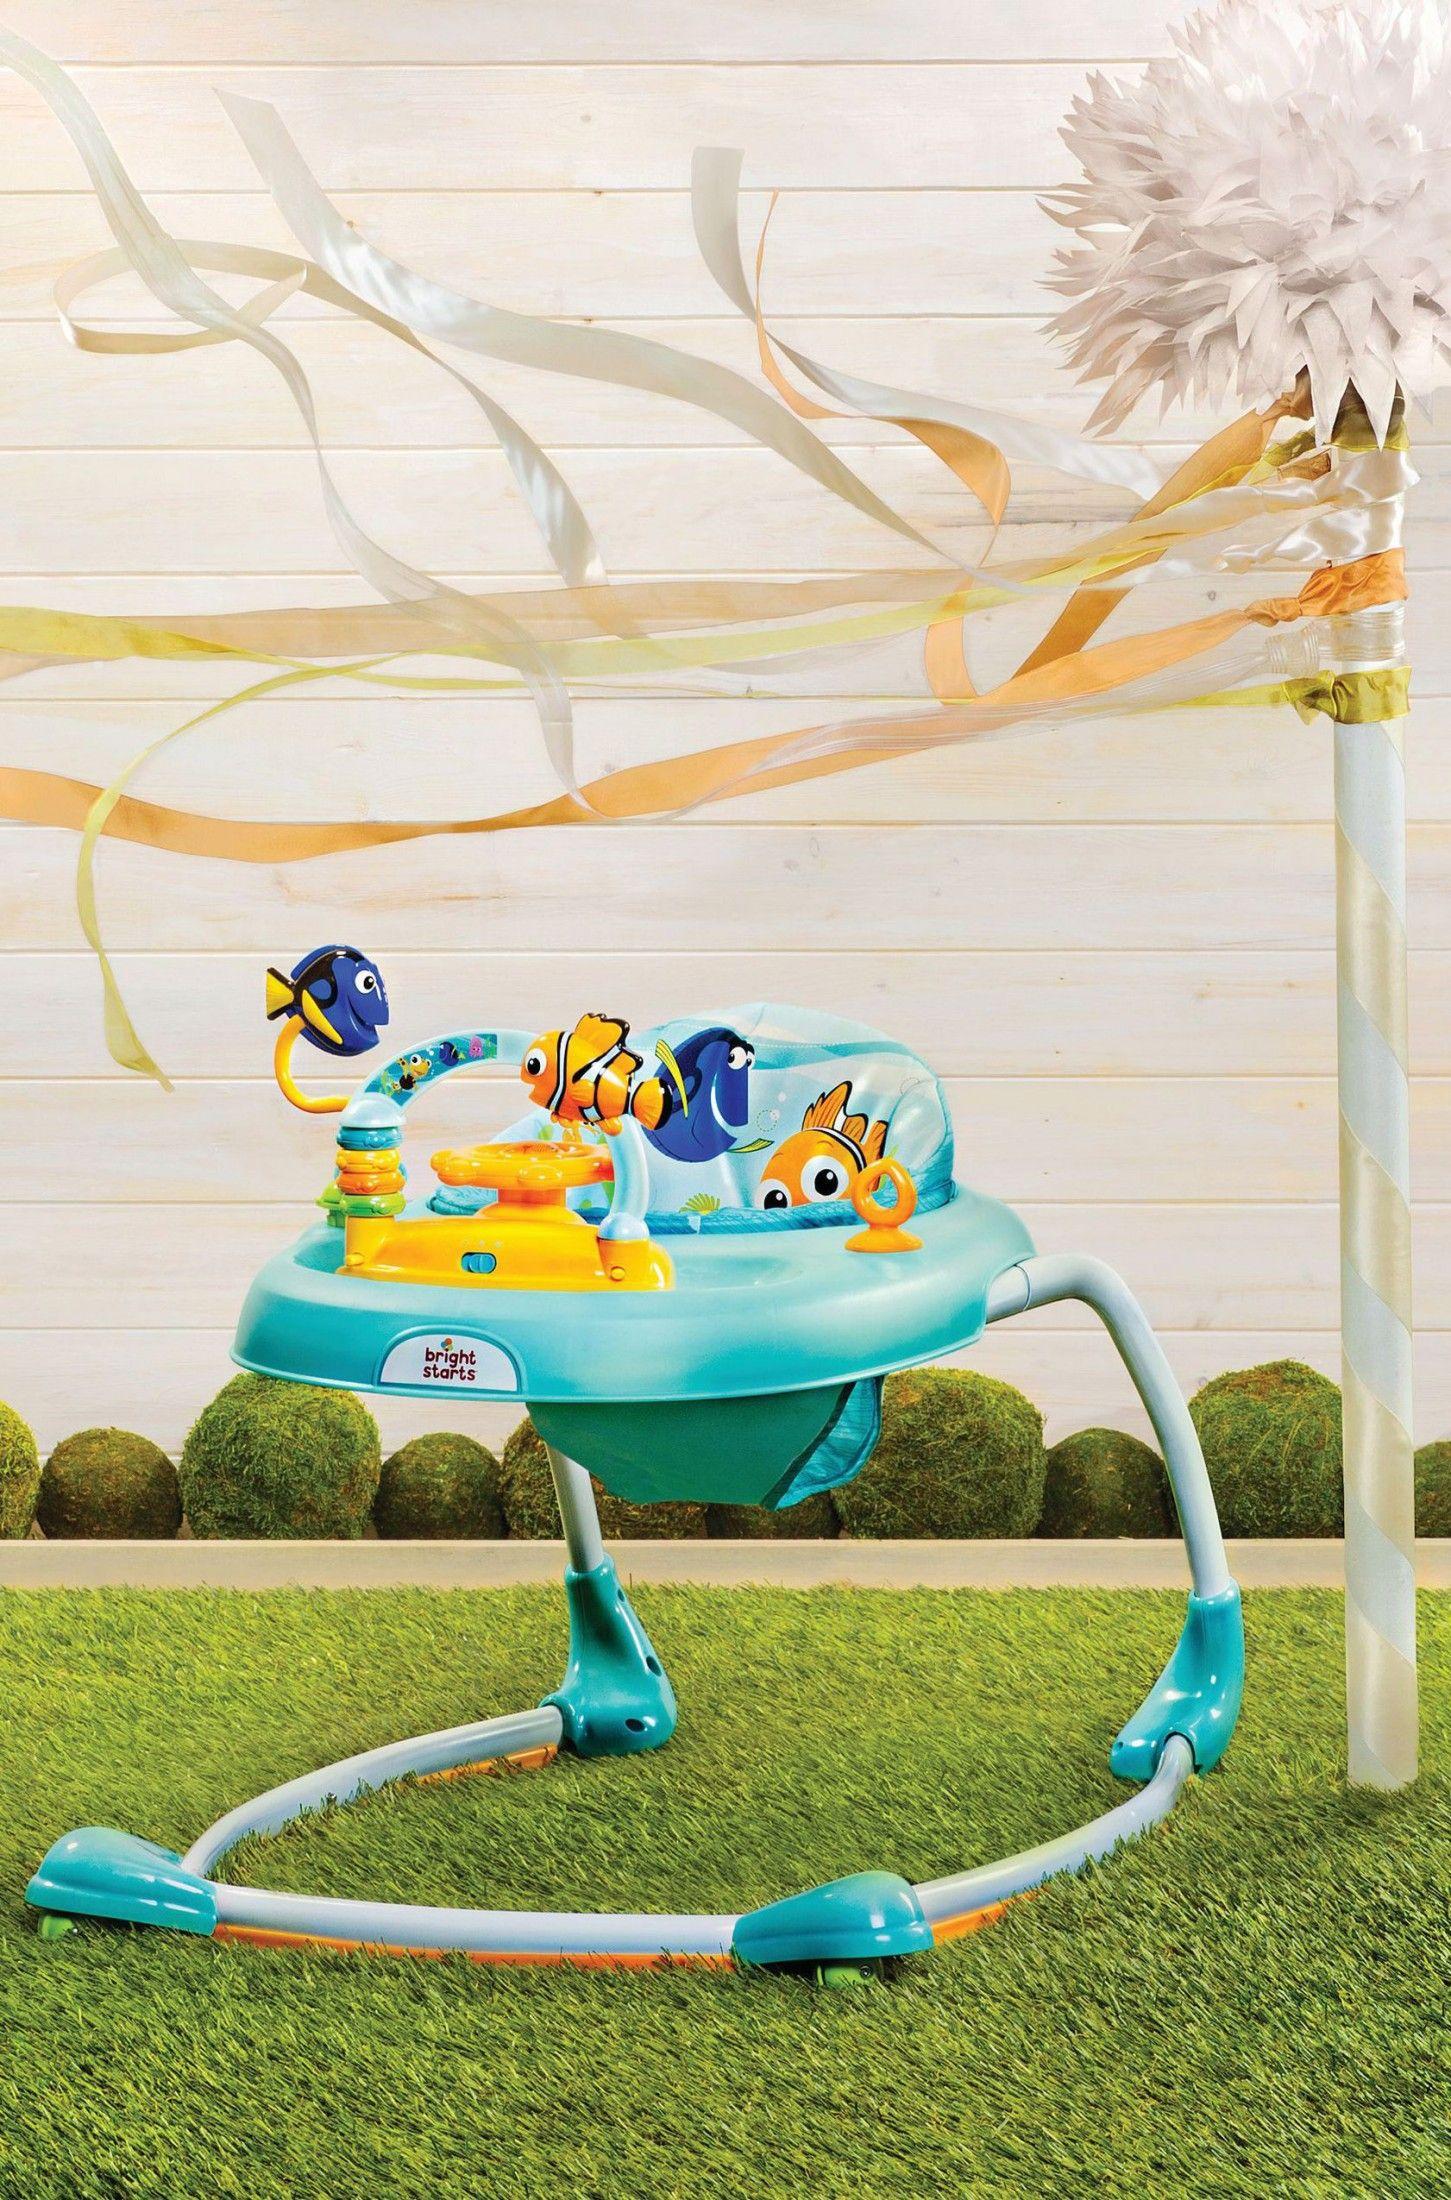 [ad] Explore the world with a Disney Baby Nemo & Dory